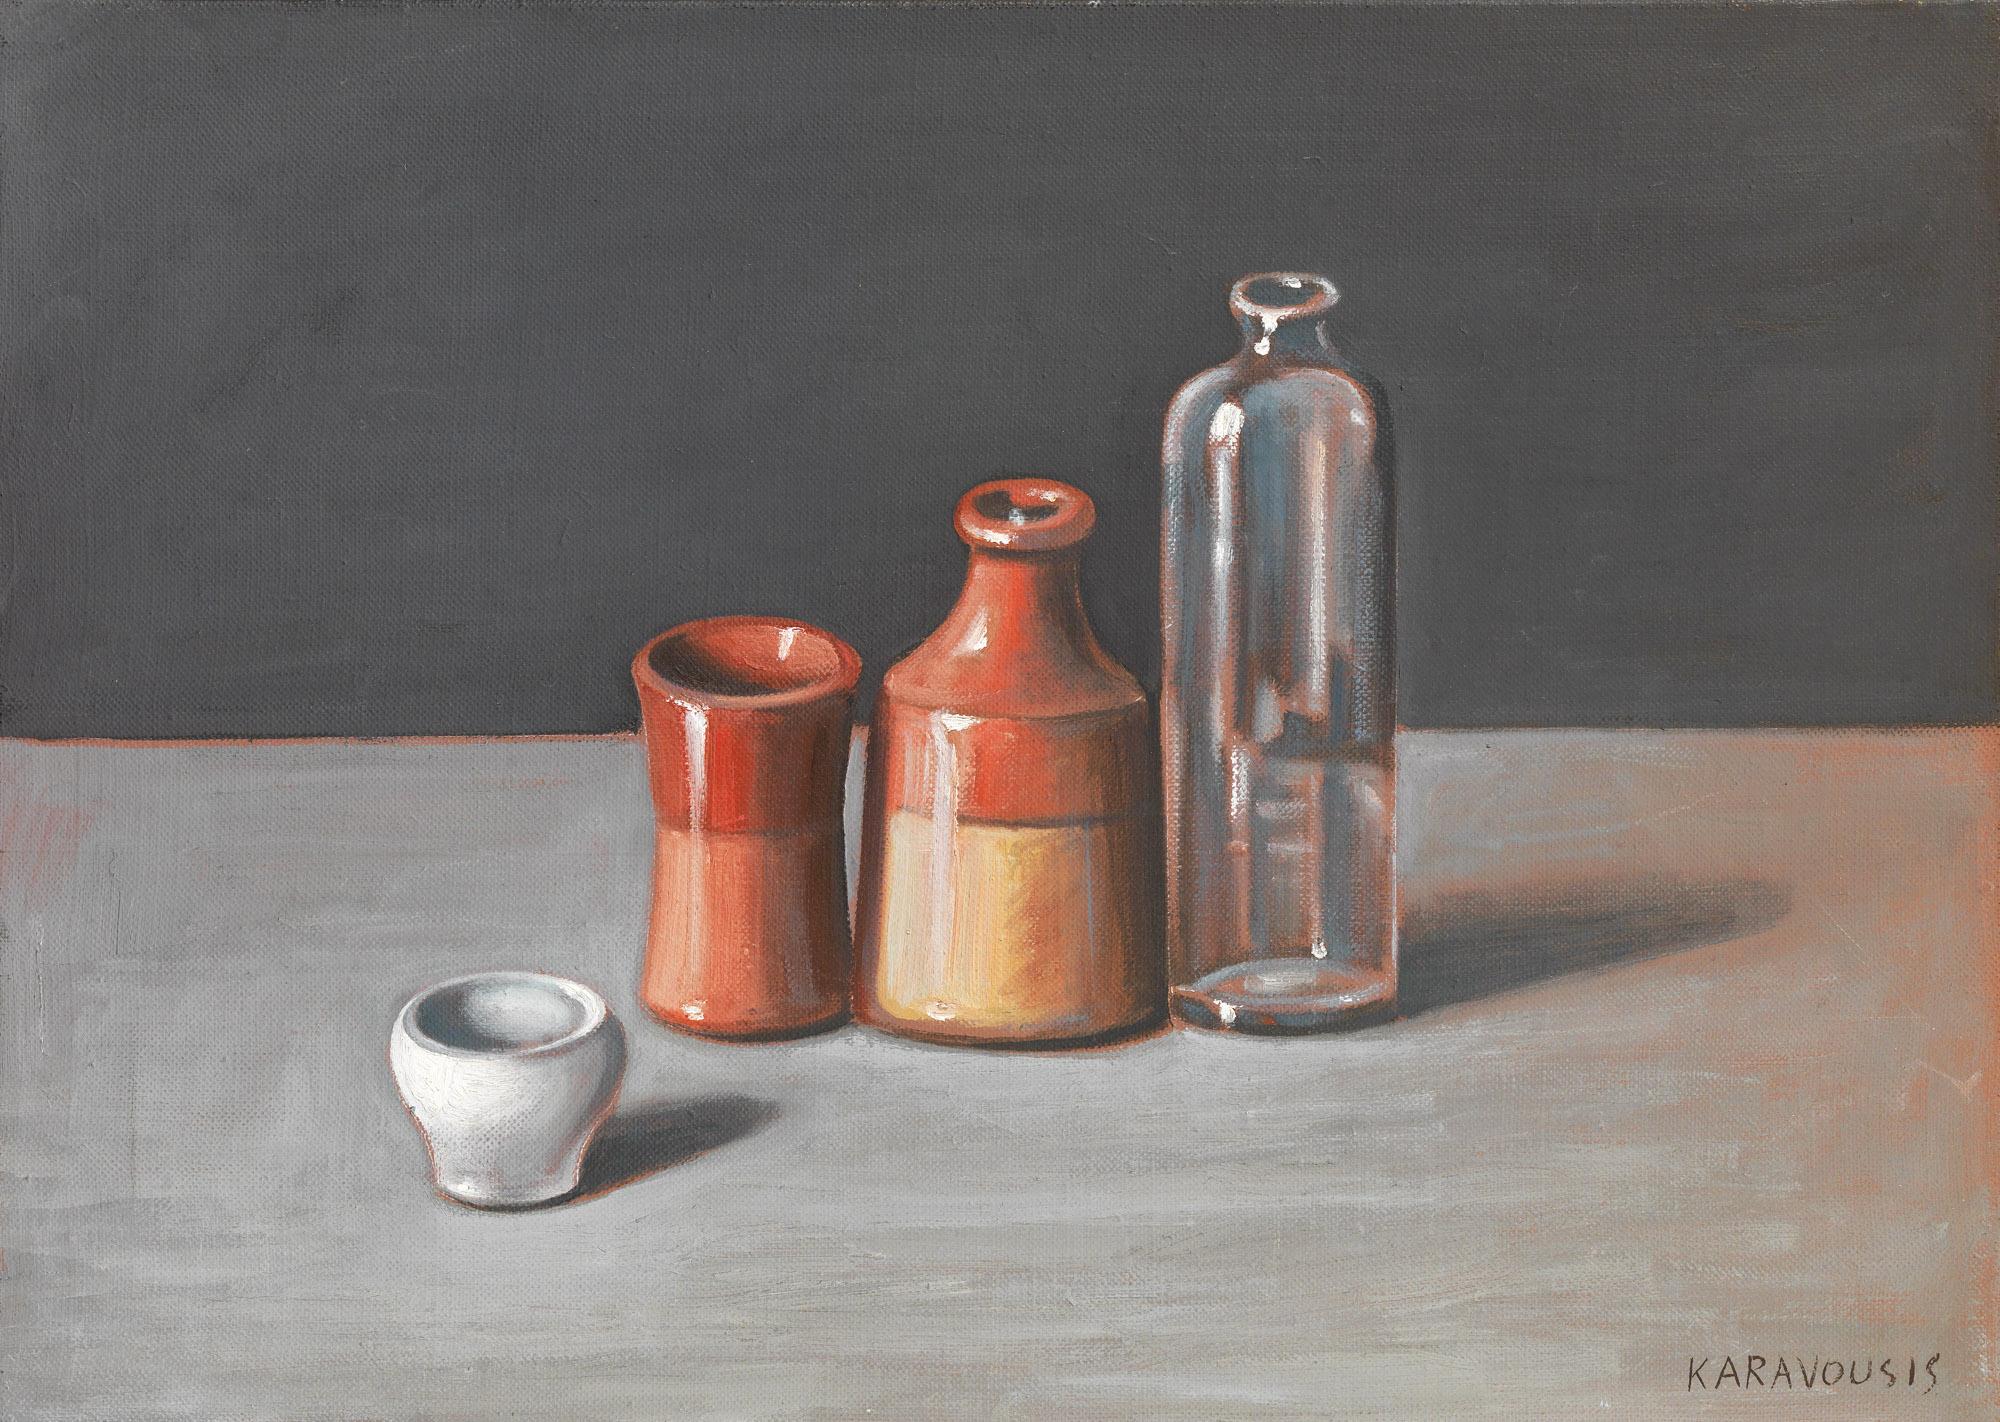 Sarandis Karavouzis - Still life with vases